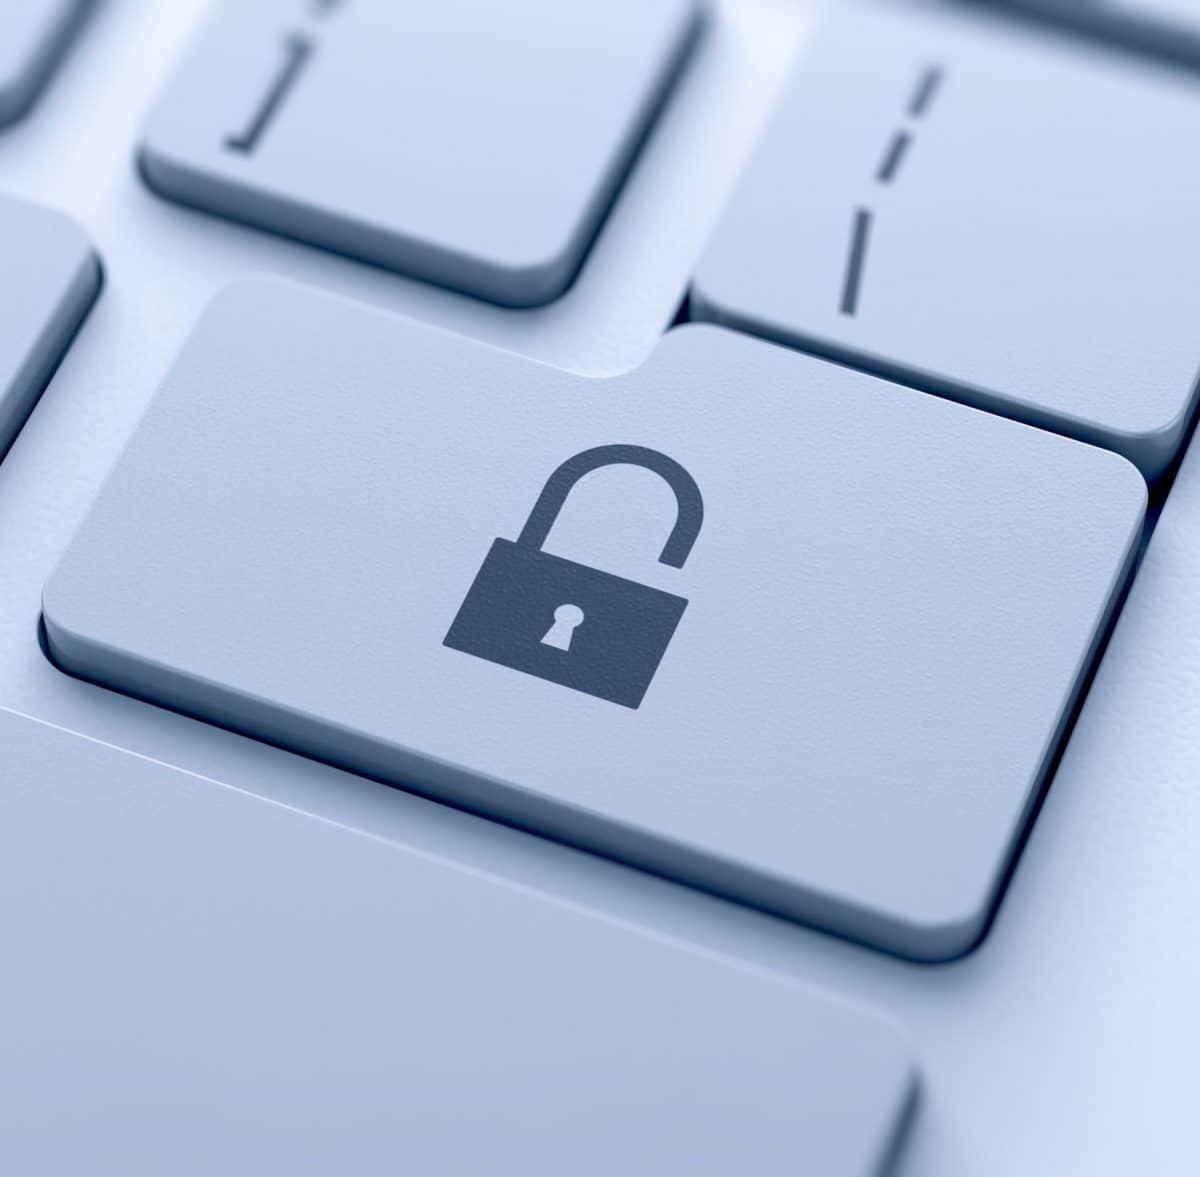 password-online-security-e1433175805210